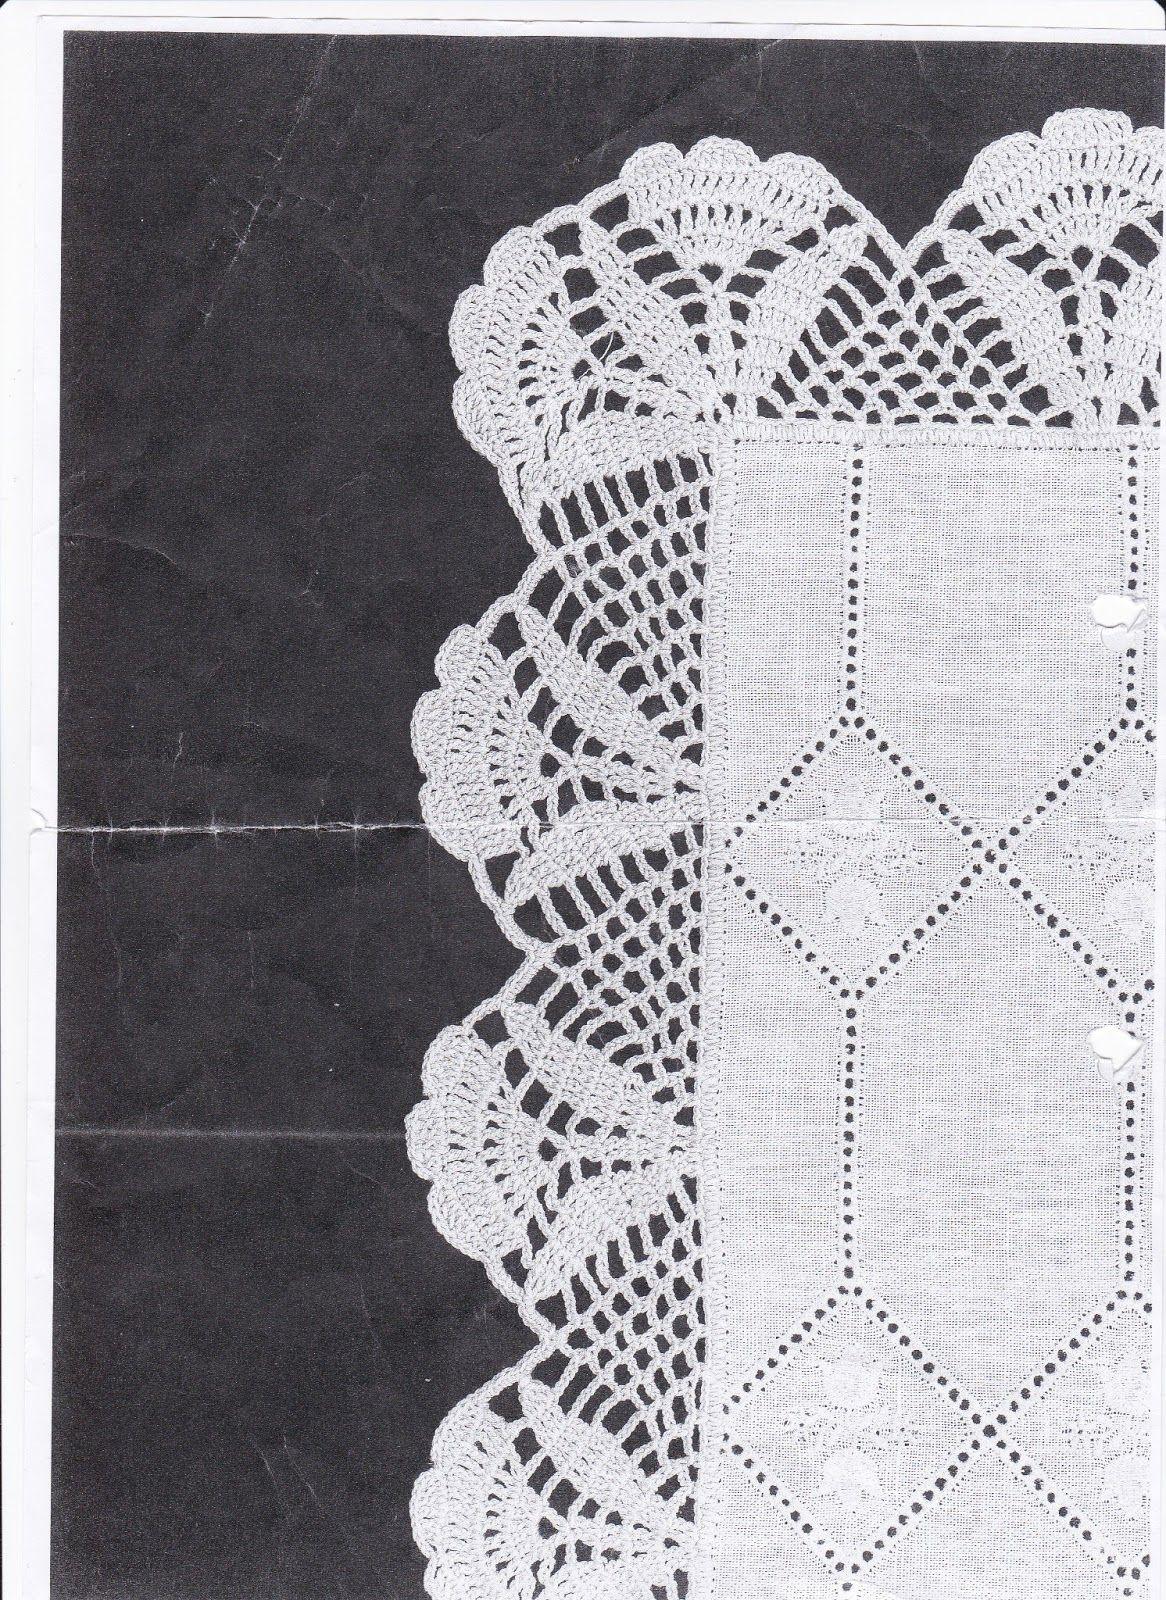 Pin de Phina Moran en BORDES EN CROCHET | Pinterest | Ganchillo ...